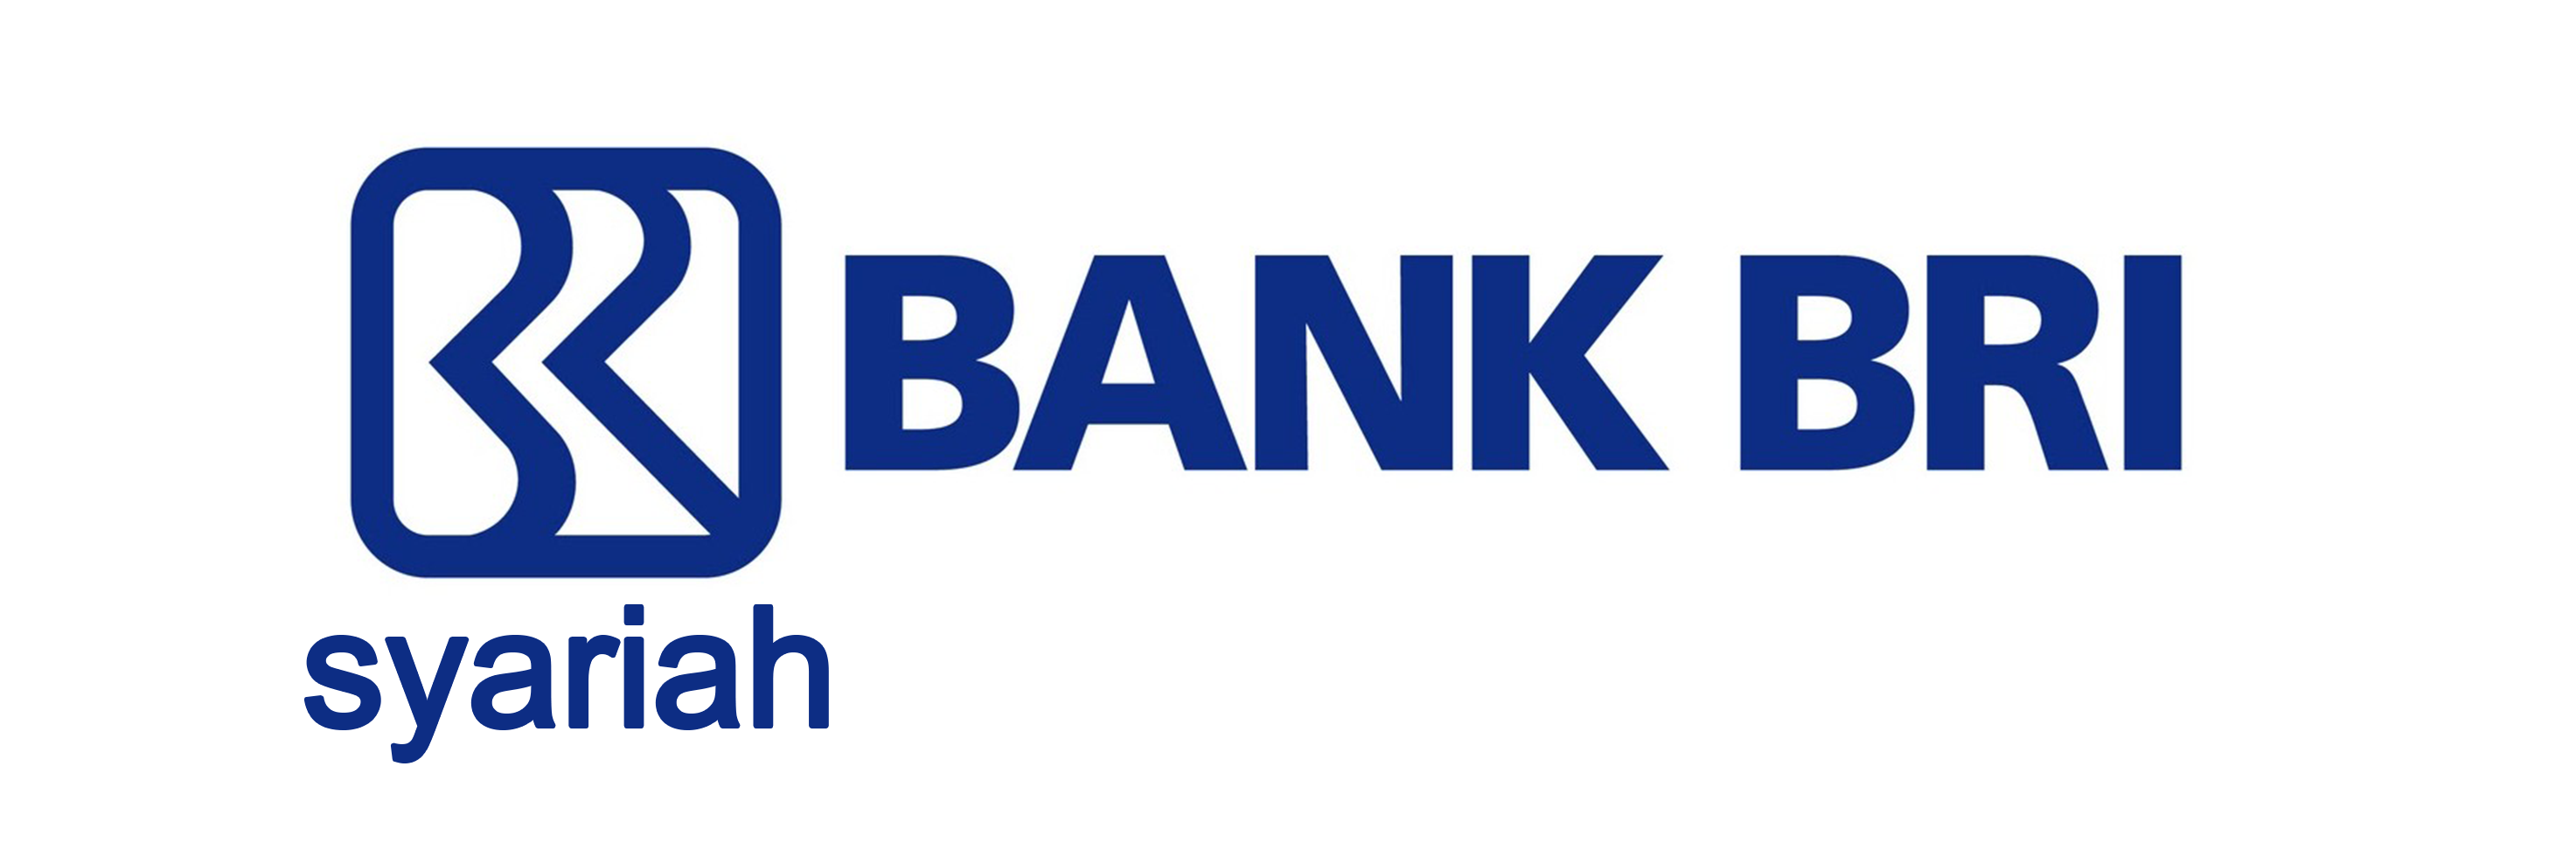 bank-BRI-syariah